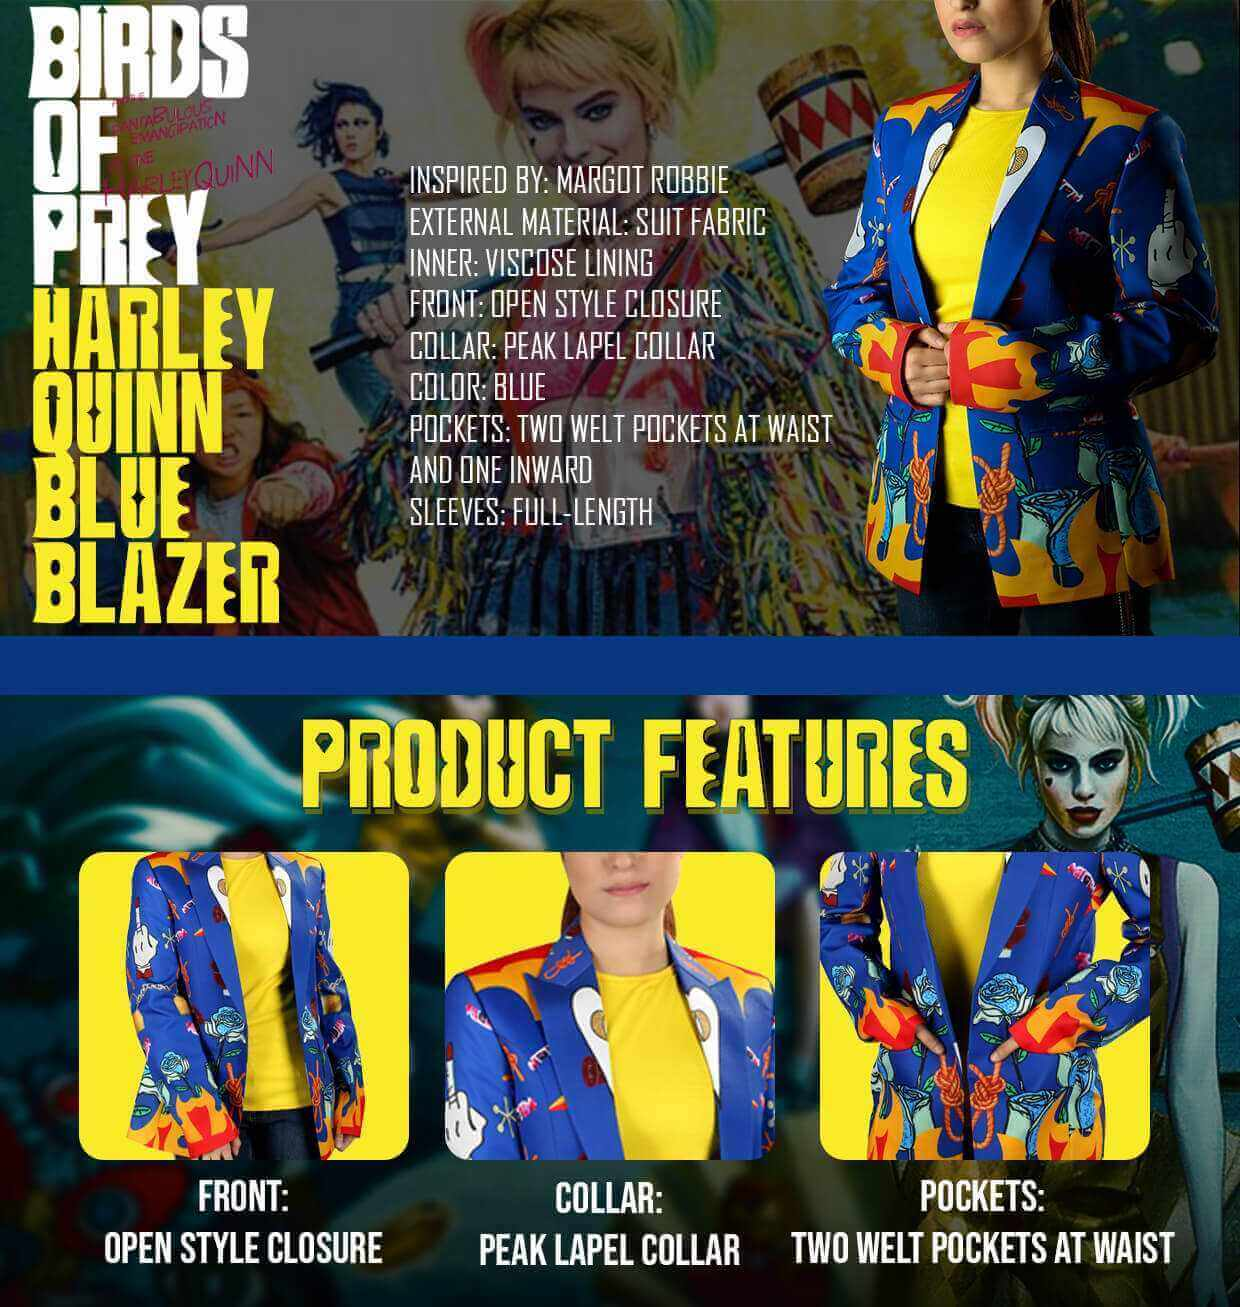 Birds Of Prey Harley Quinn Blazer